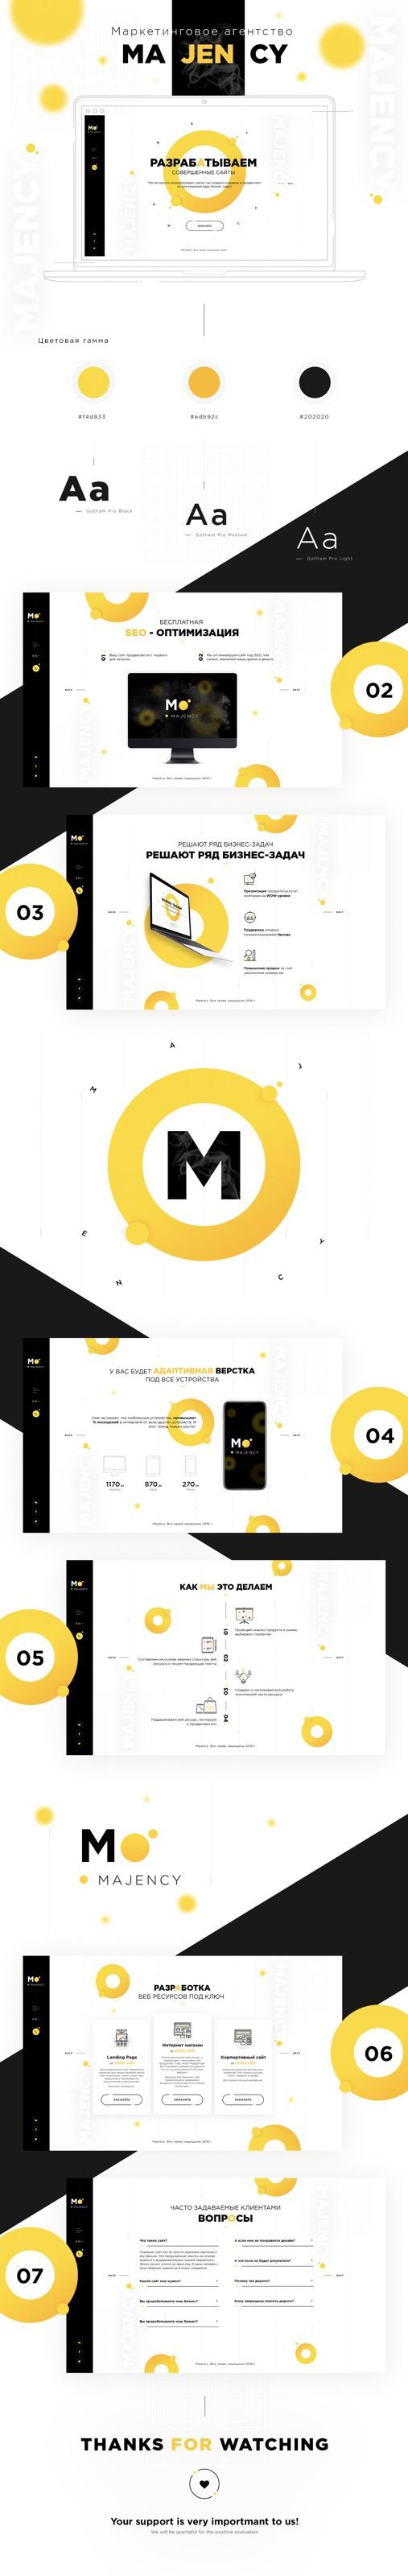 Magency | Landing Page